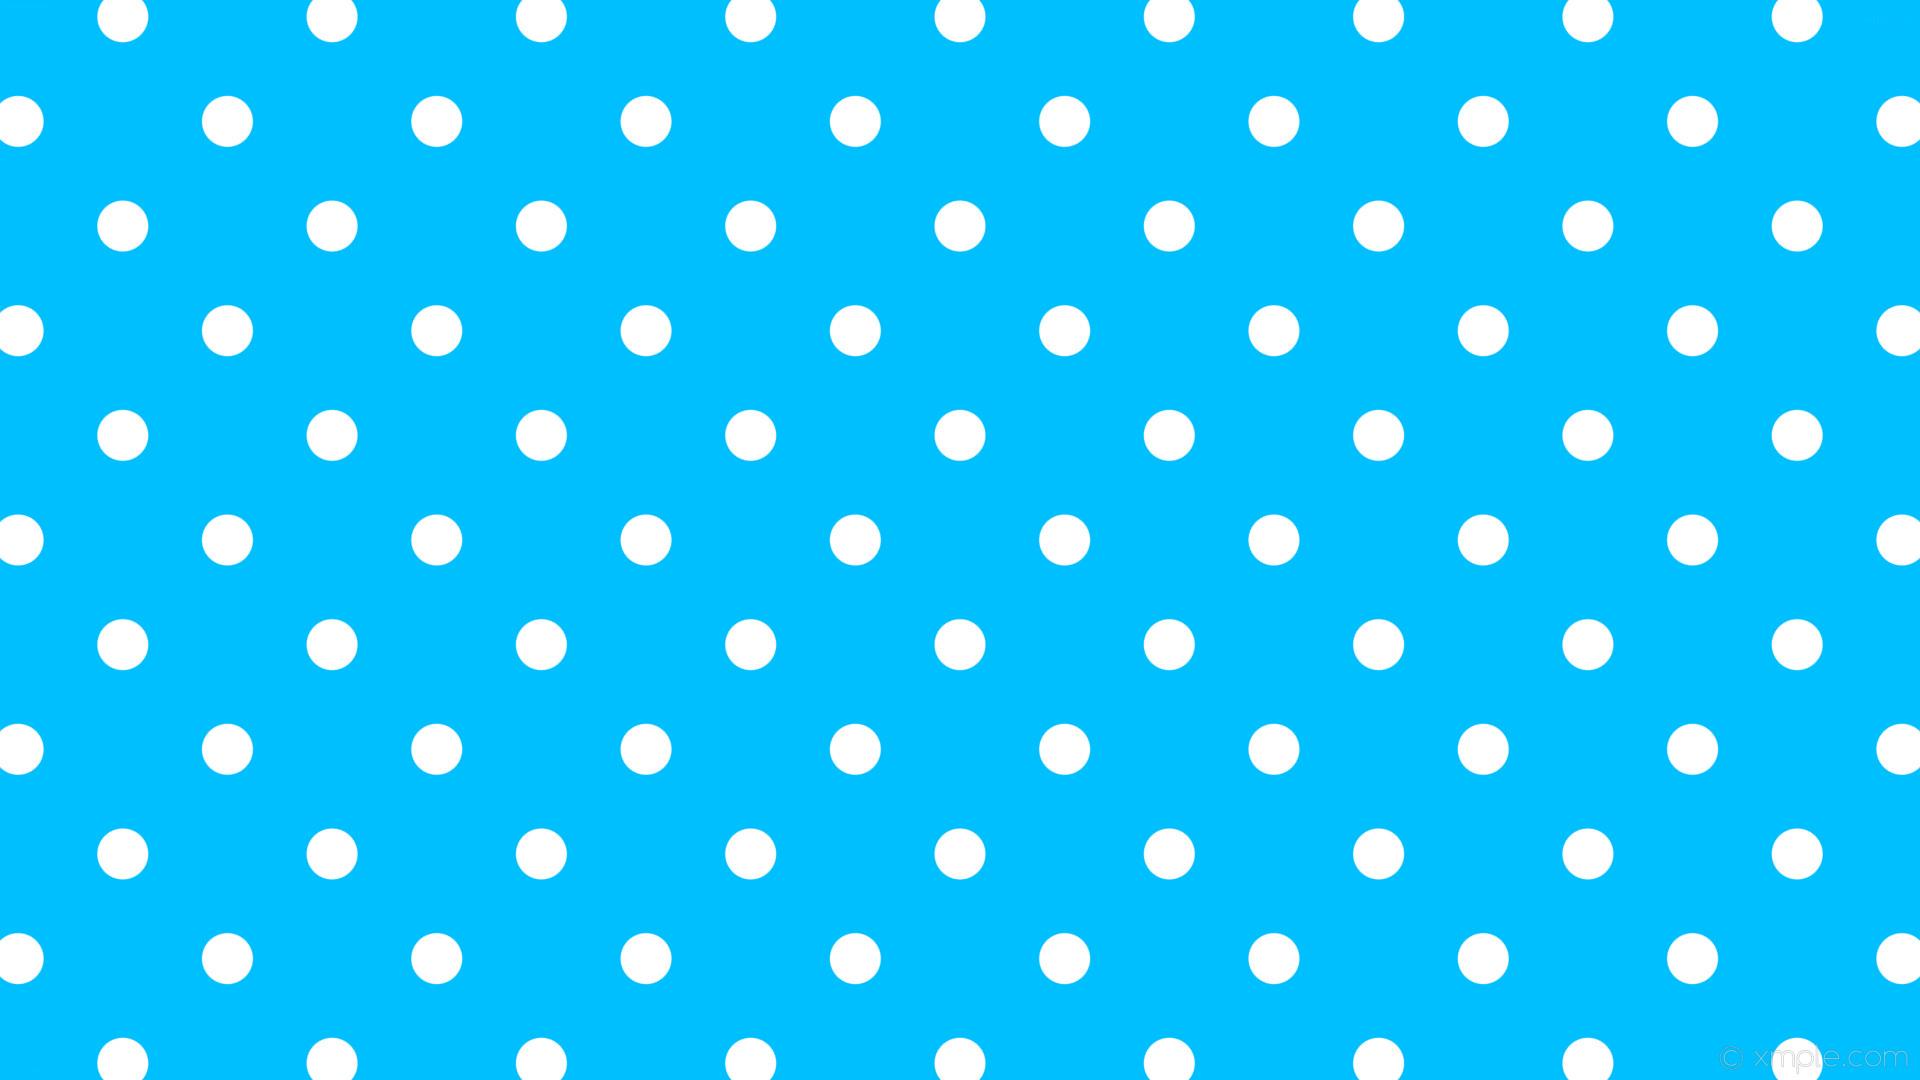 wallpaper spots blue white polka dots deep sky blue #00bfff #ffffff 225°  51px